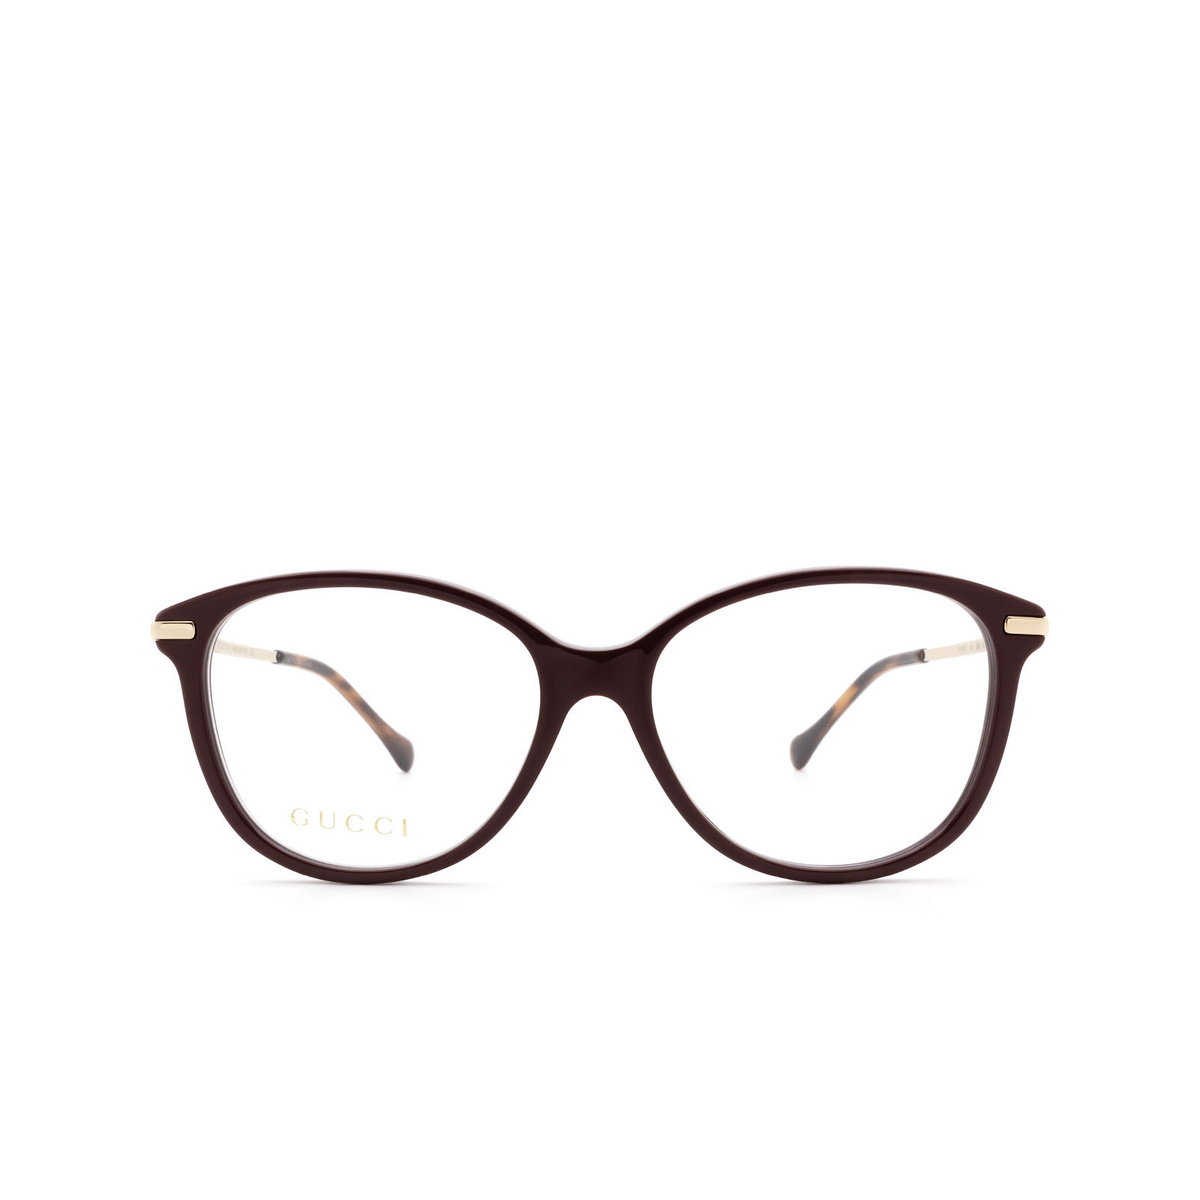 Gucci® Cat-eye Eyeglasses: GG0967O color Brown 003.